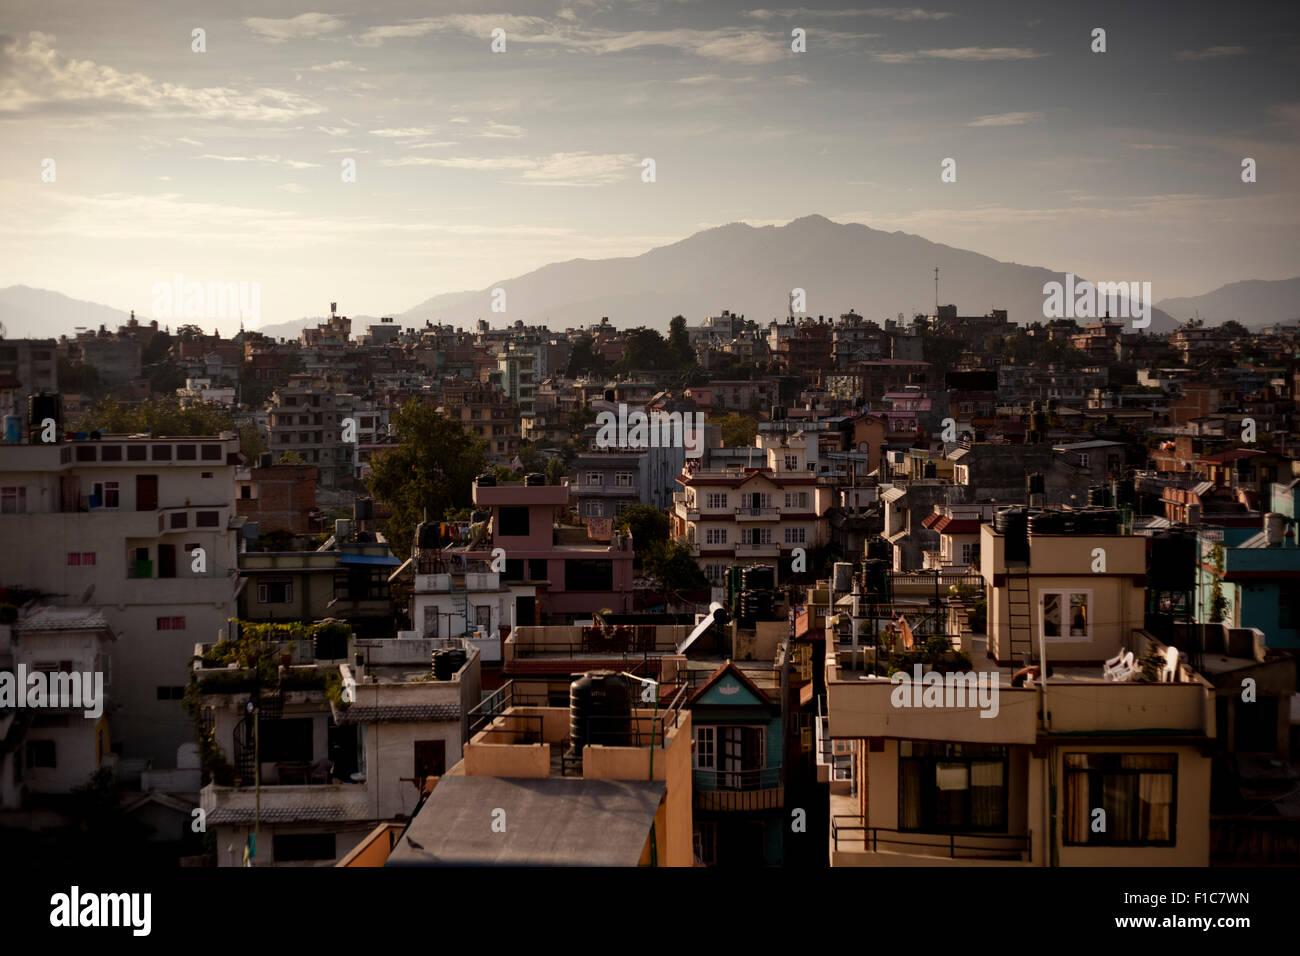 Kathmandu, view, houses - Stock Image